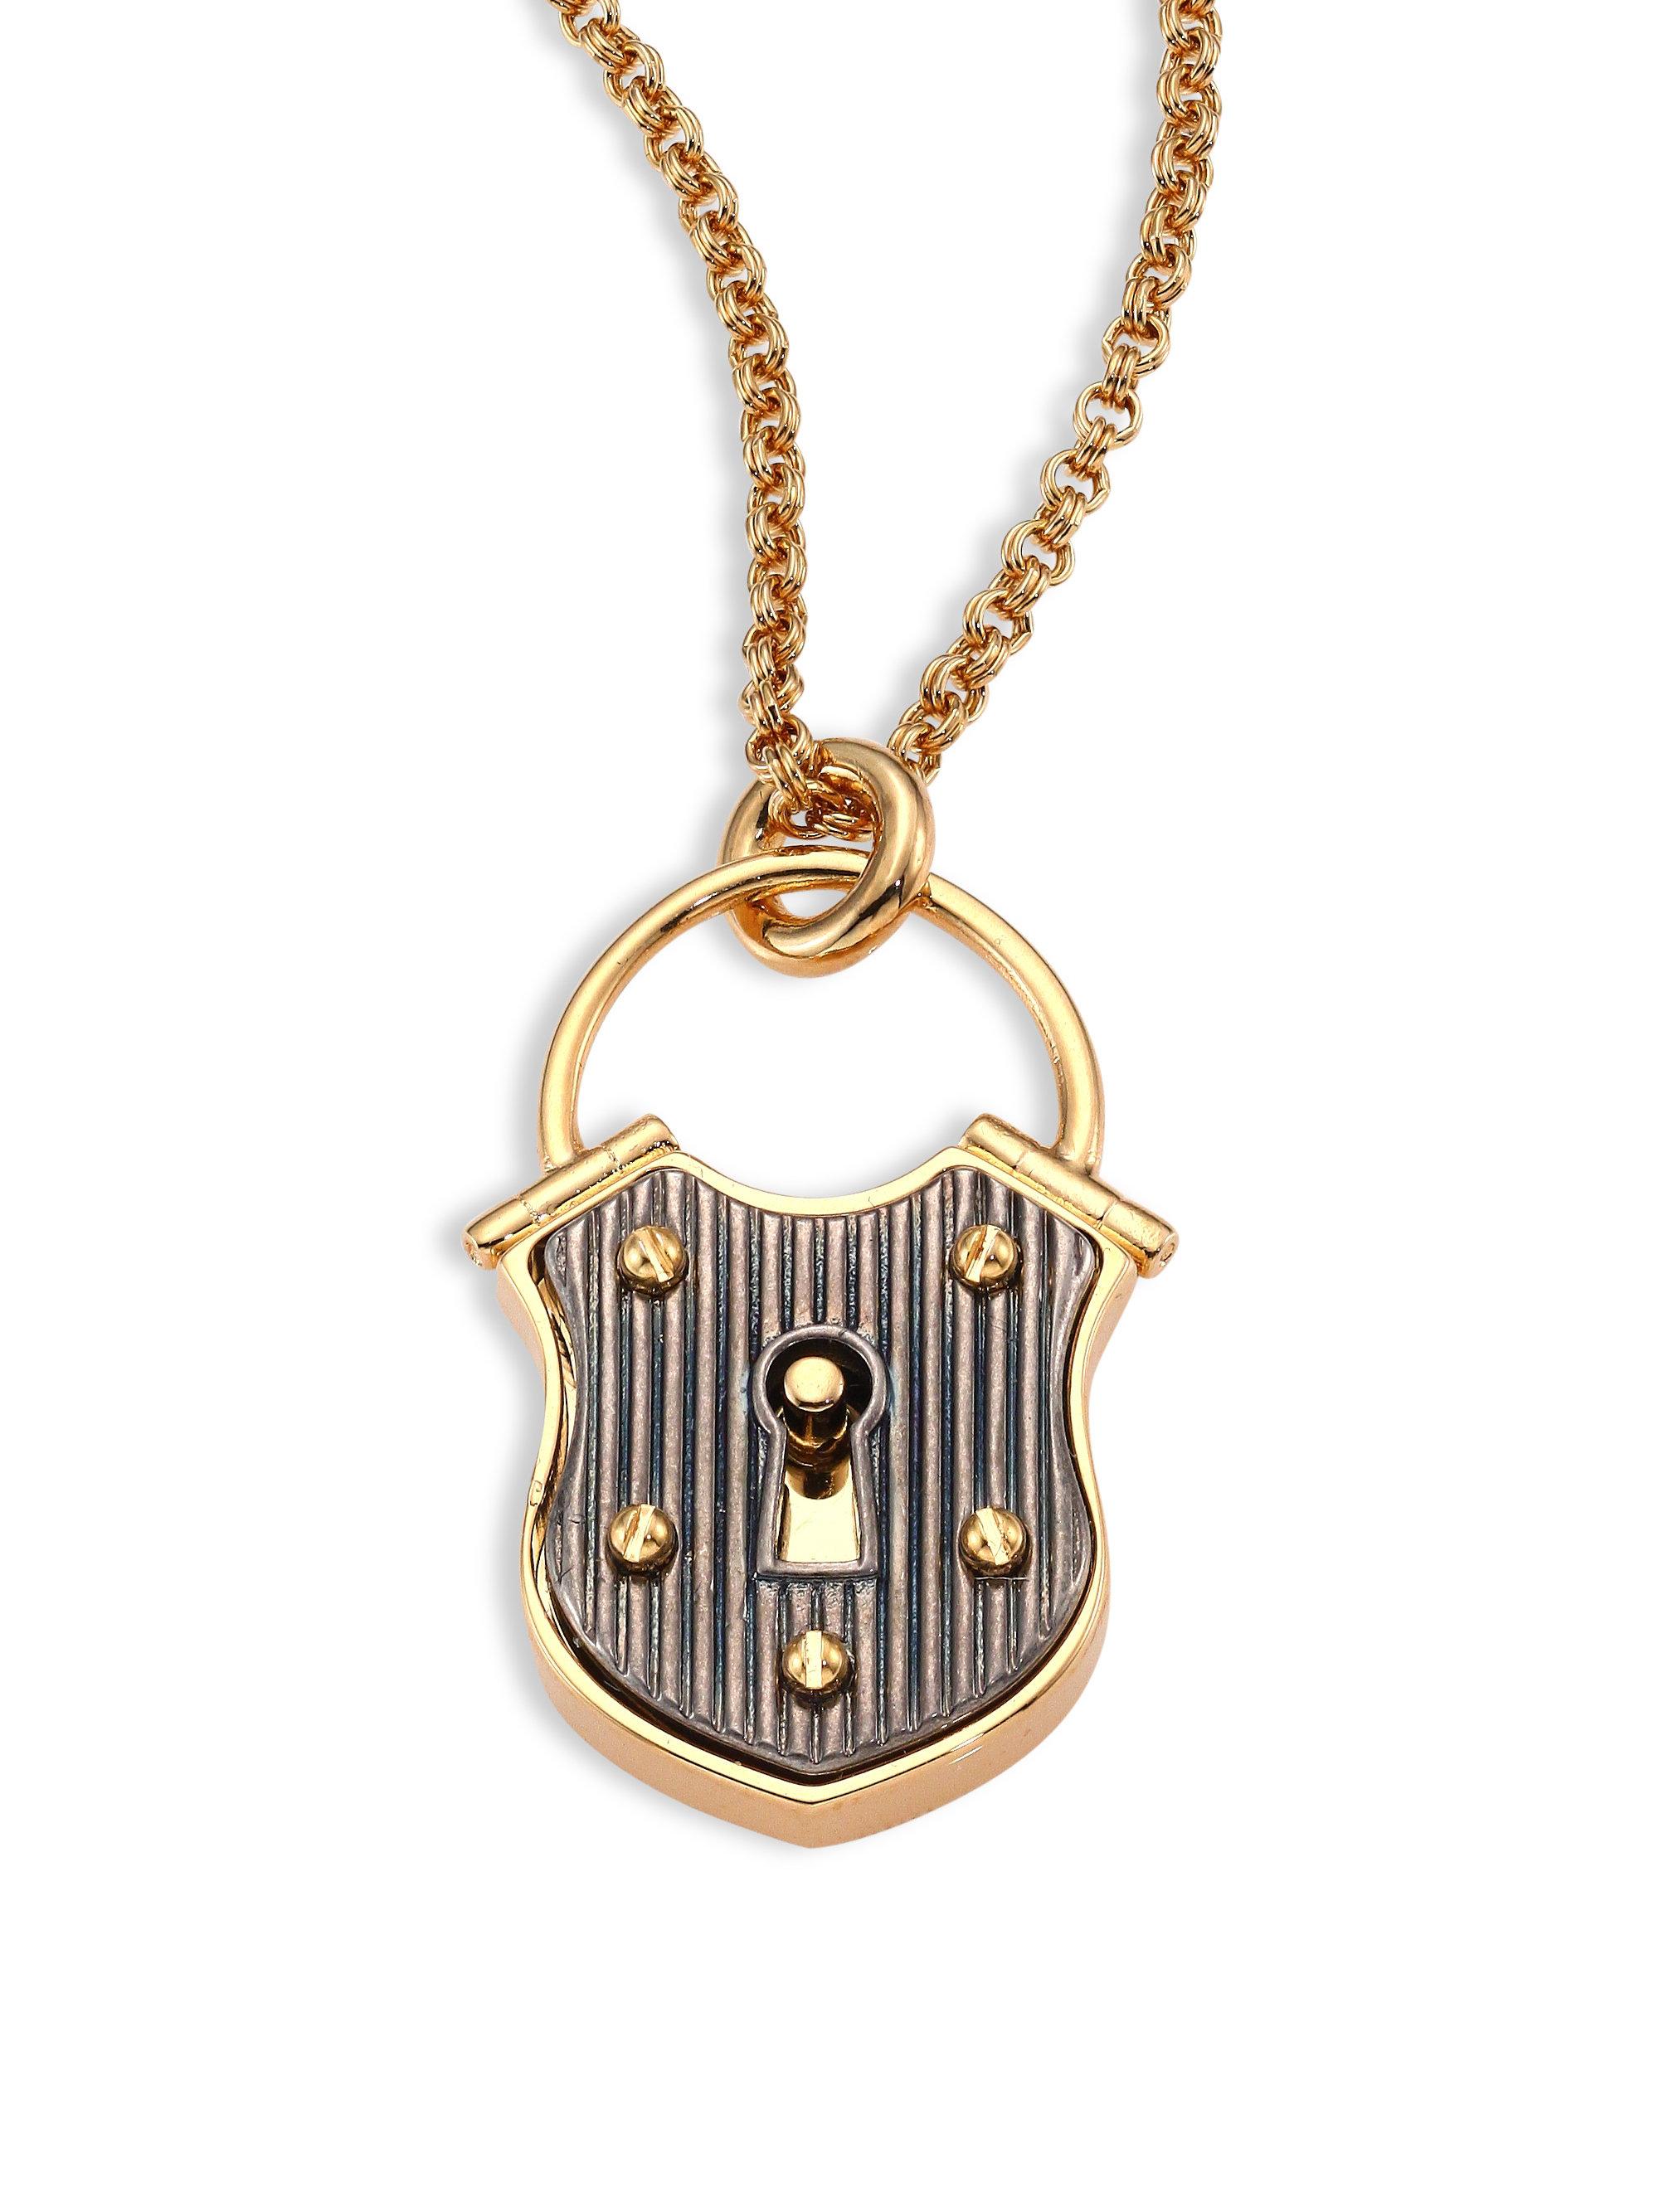 Lanvin Lock Short Pendant Necklace in Metallic